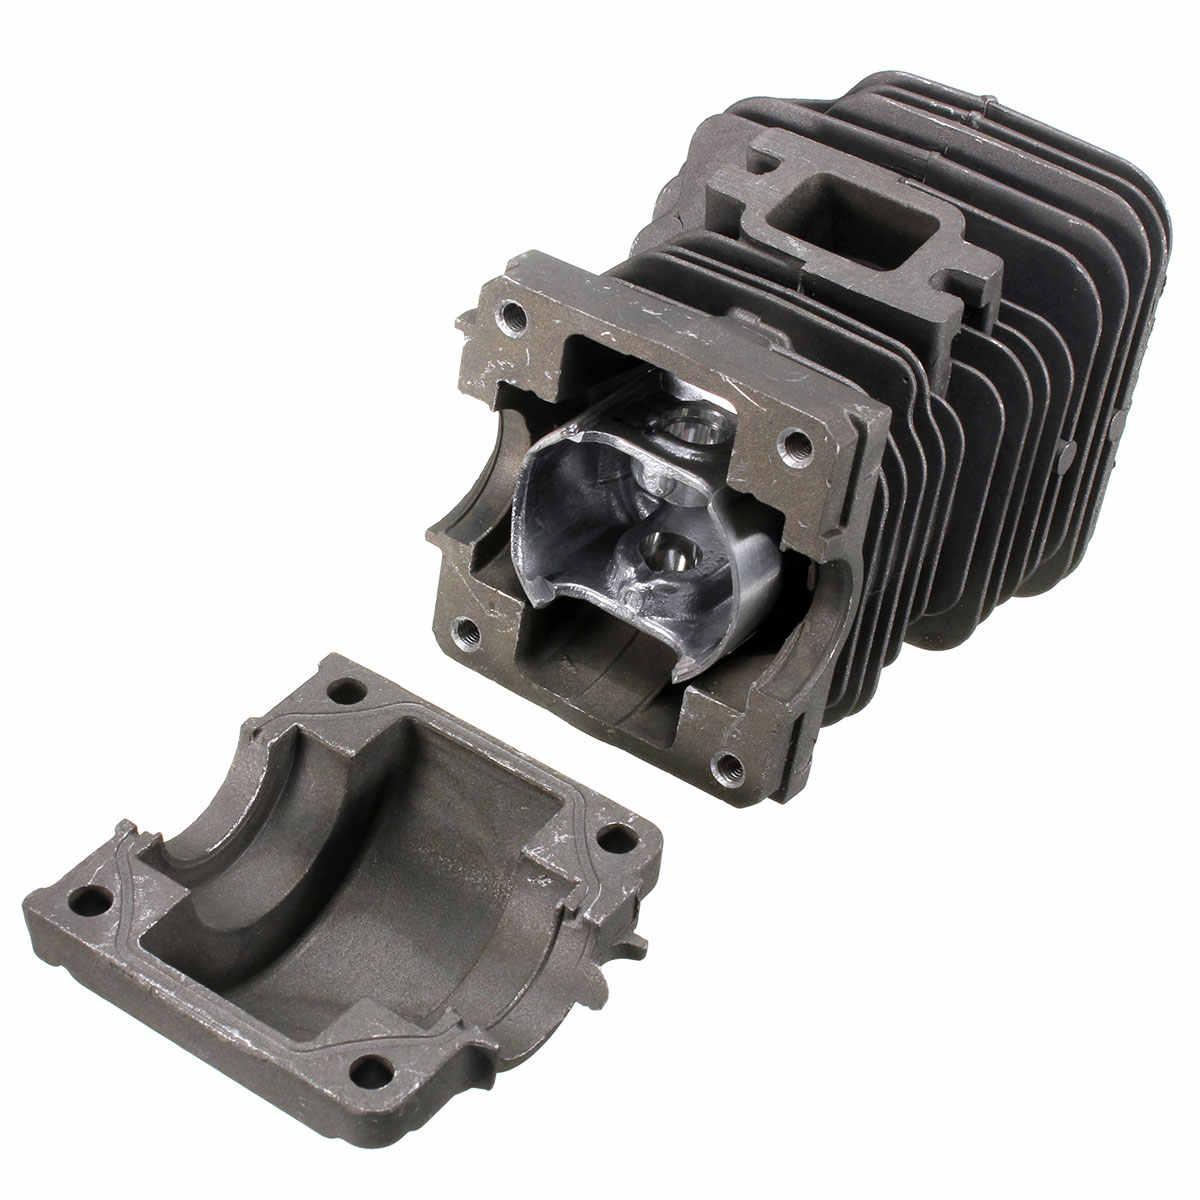 42.5mm מנוע מנוע לstihl MS250 צילינדר בוכנה גל ארכובה מסור שרשרת עבור Stihl 023 025 MS230 MS25 1123 020 1209